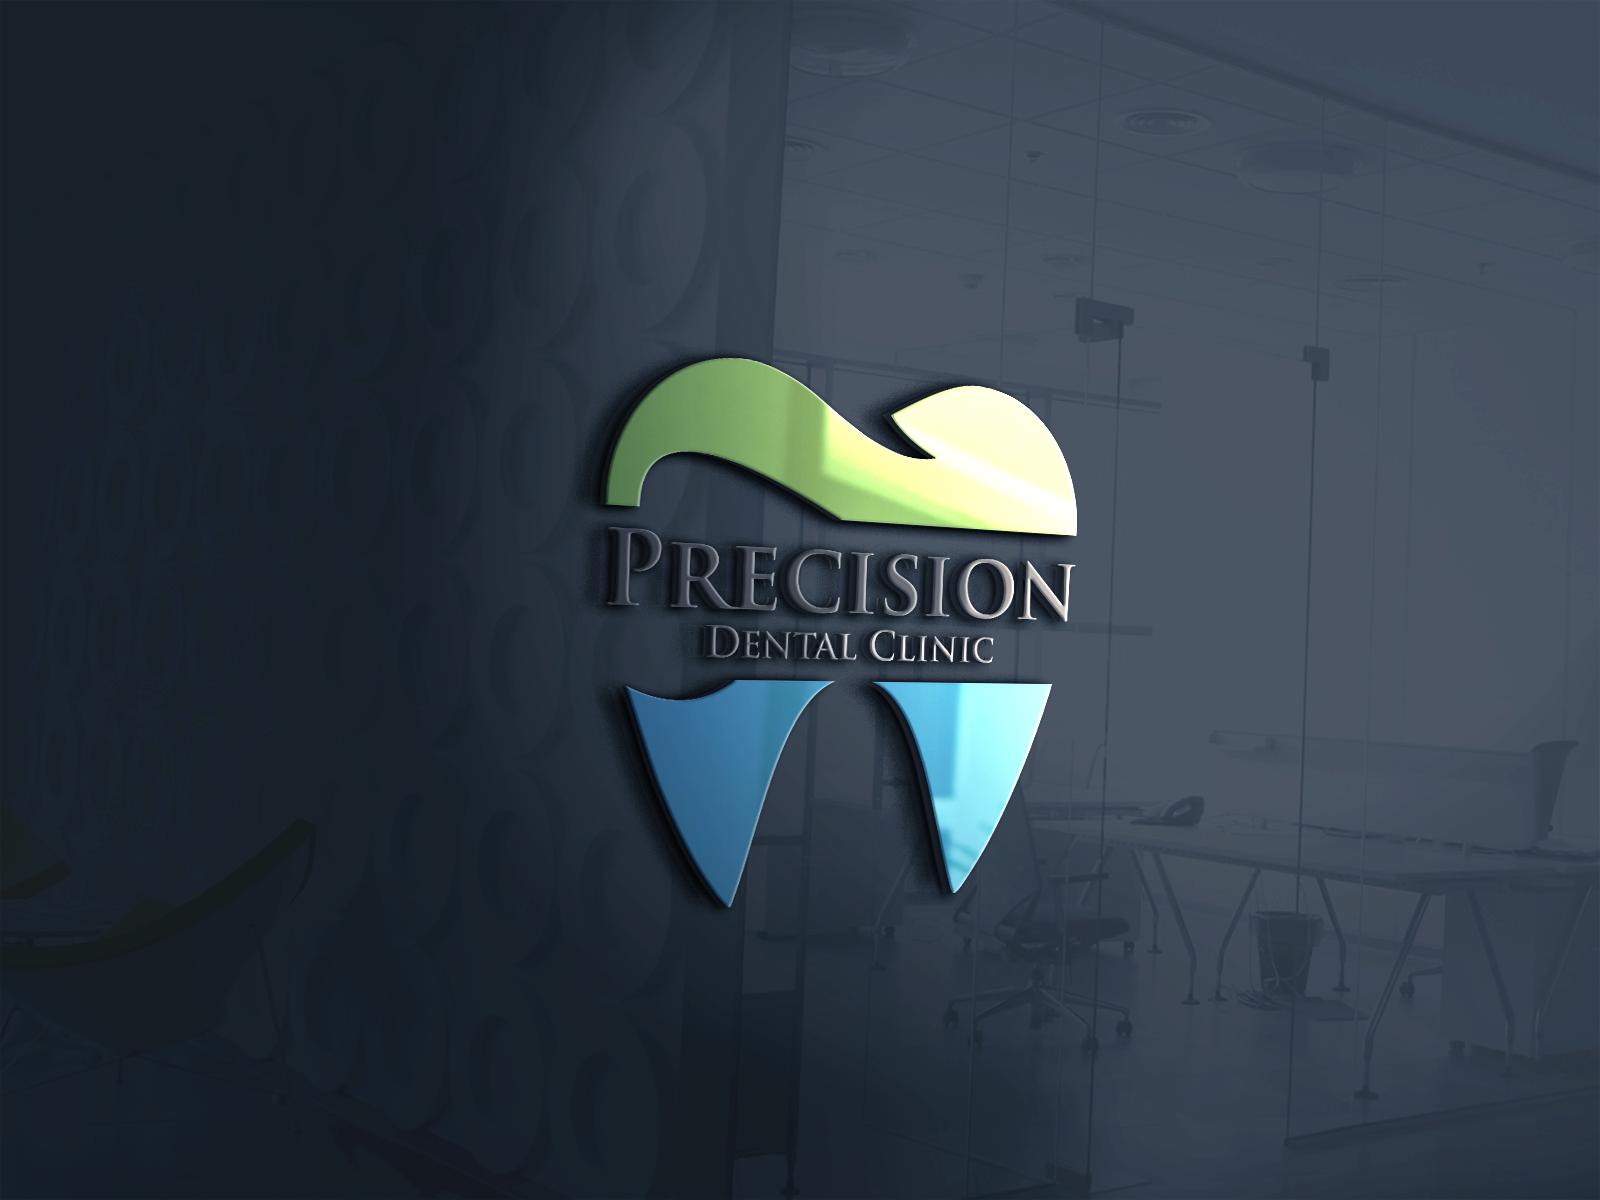 Logo Design by Ahaan - Entry No. 36 in the Logo Design Contest Captivating Logo Design for Precision Dental Clinic.